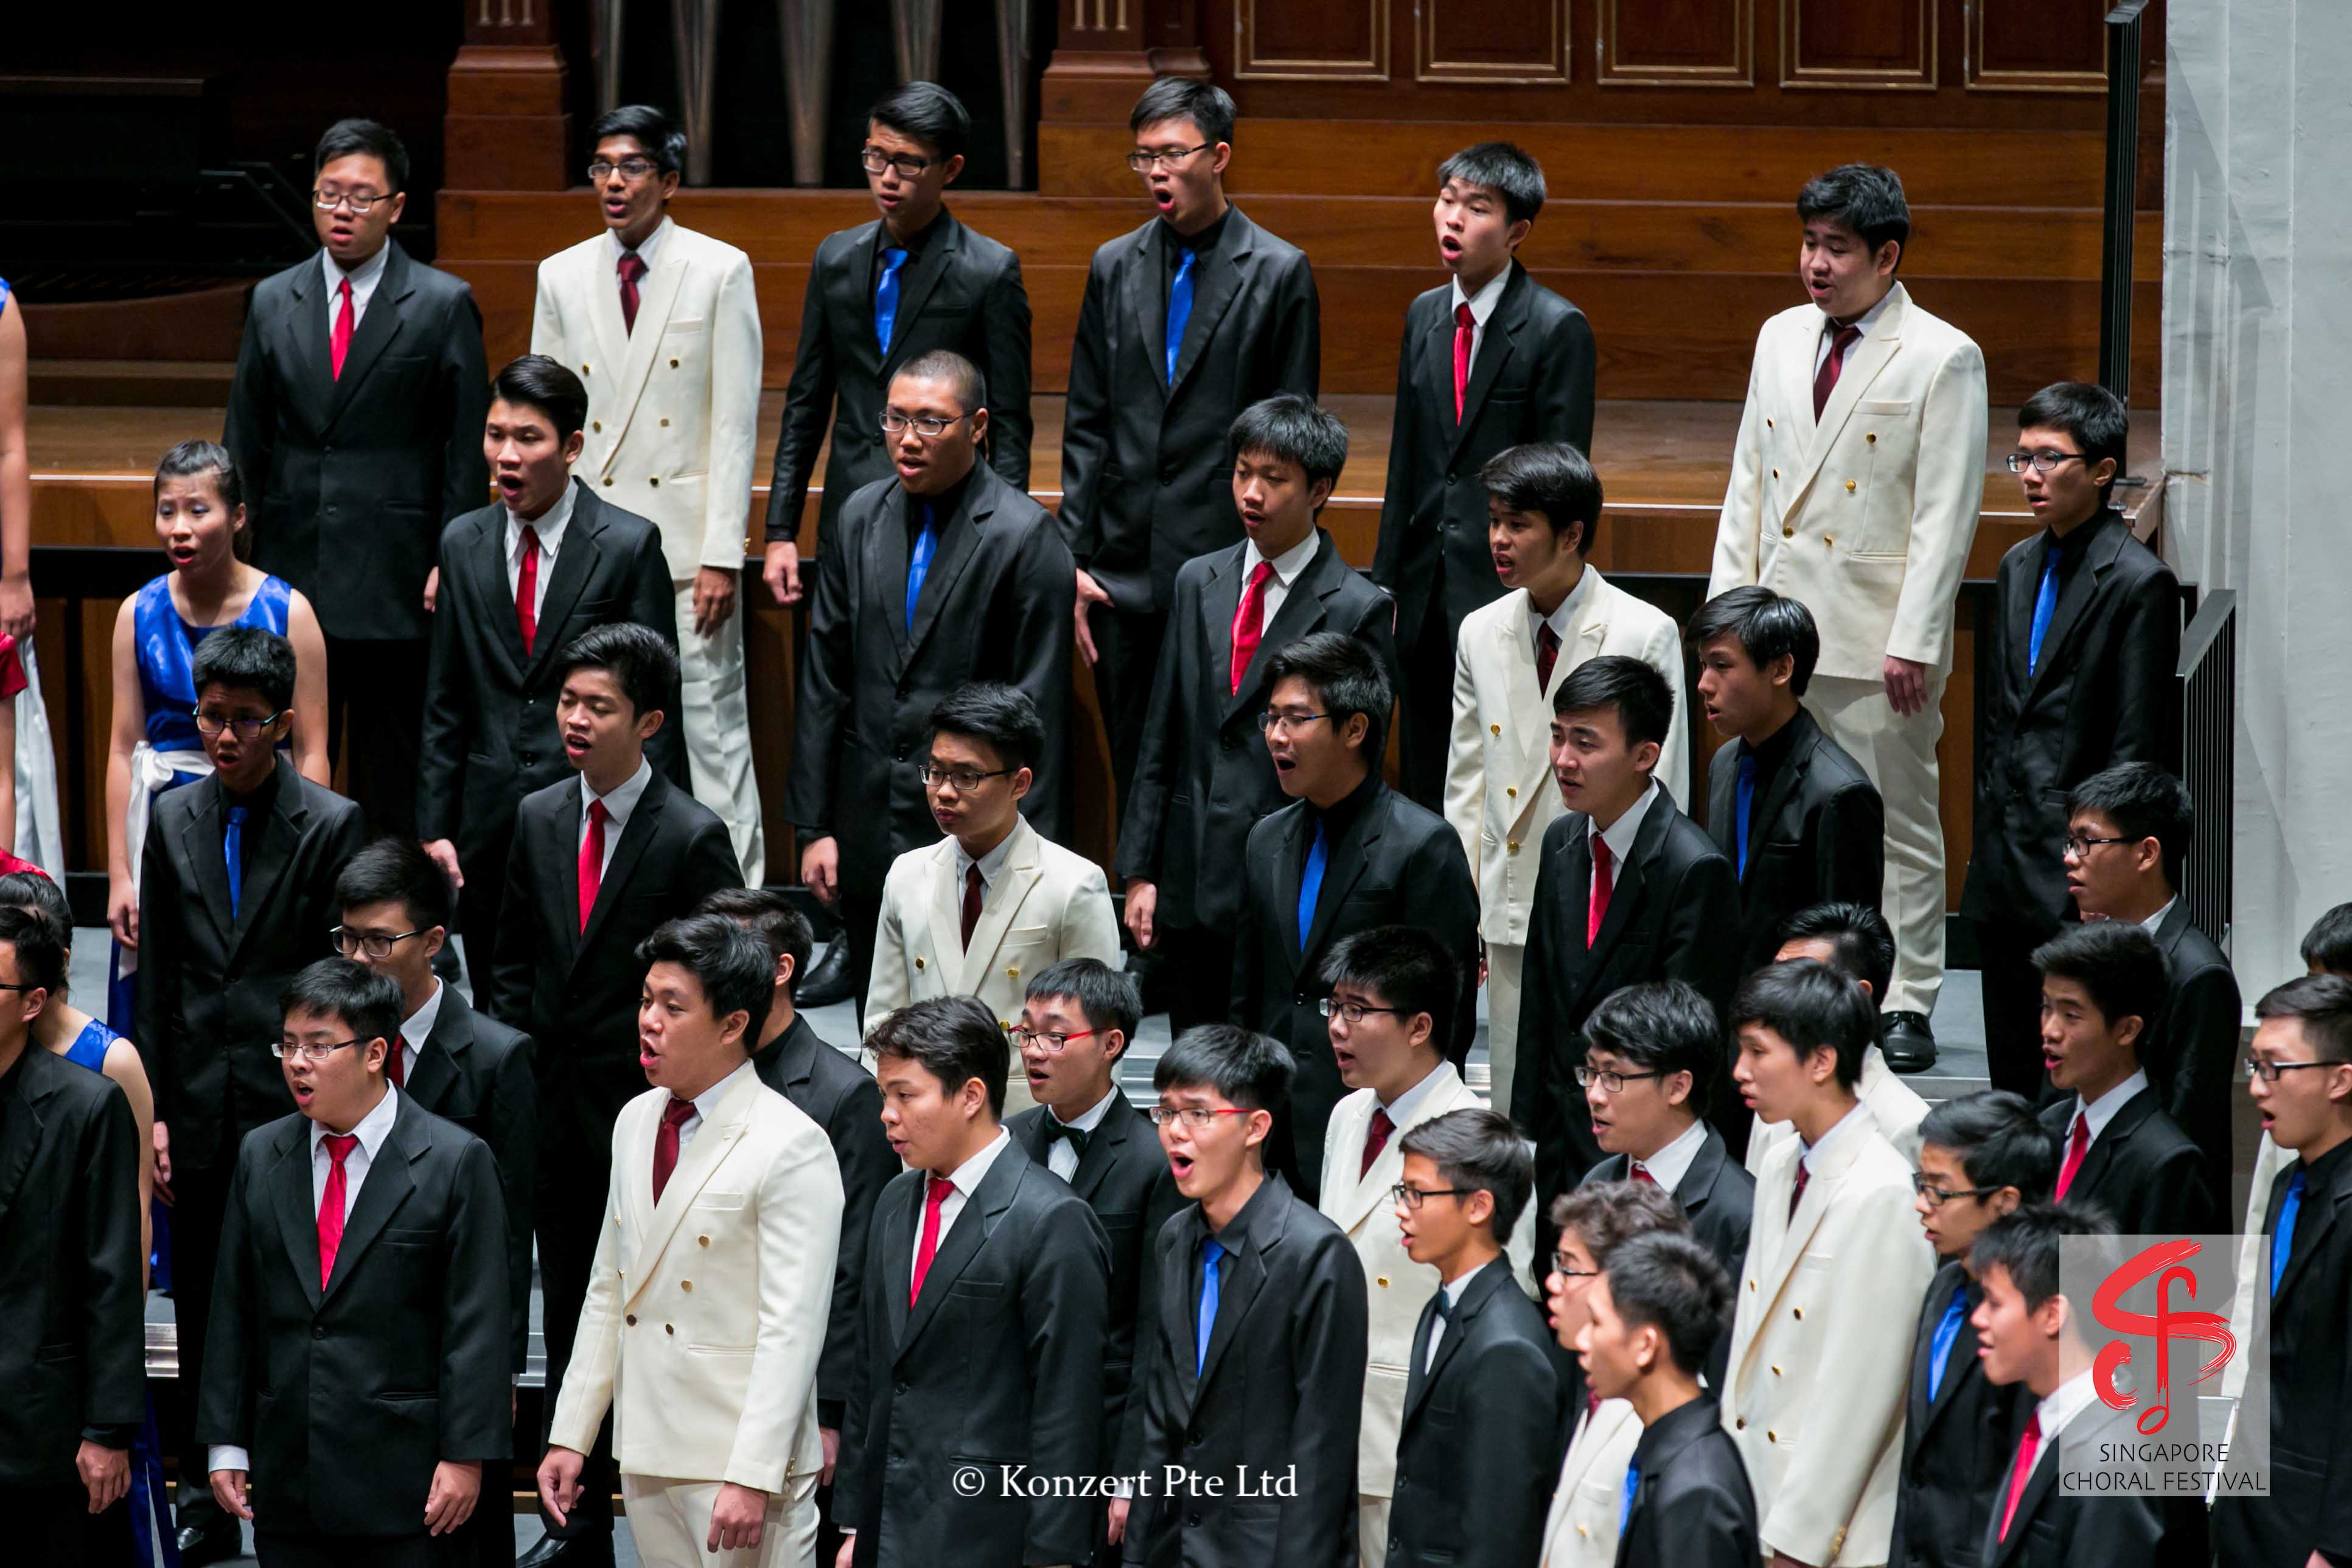 Singapore Choral Festival 7-8-15 (316).jpg